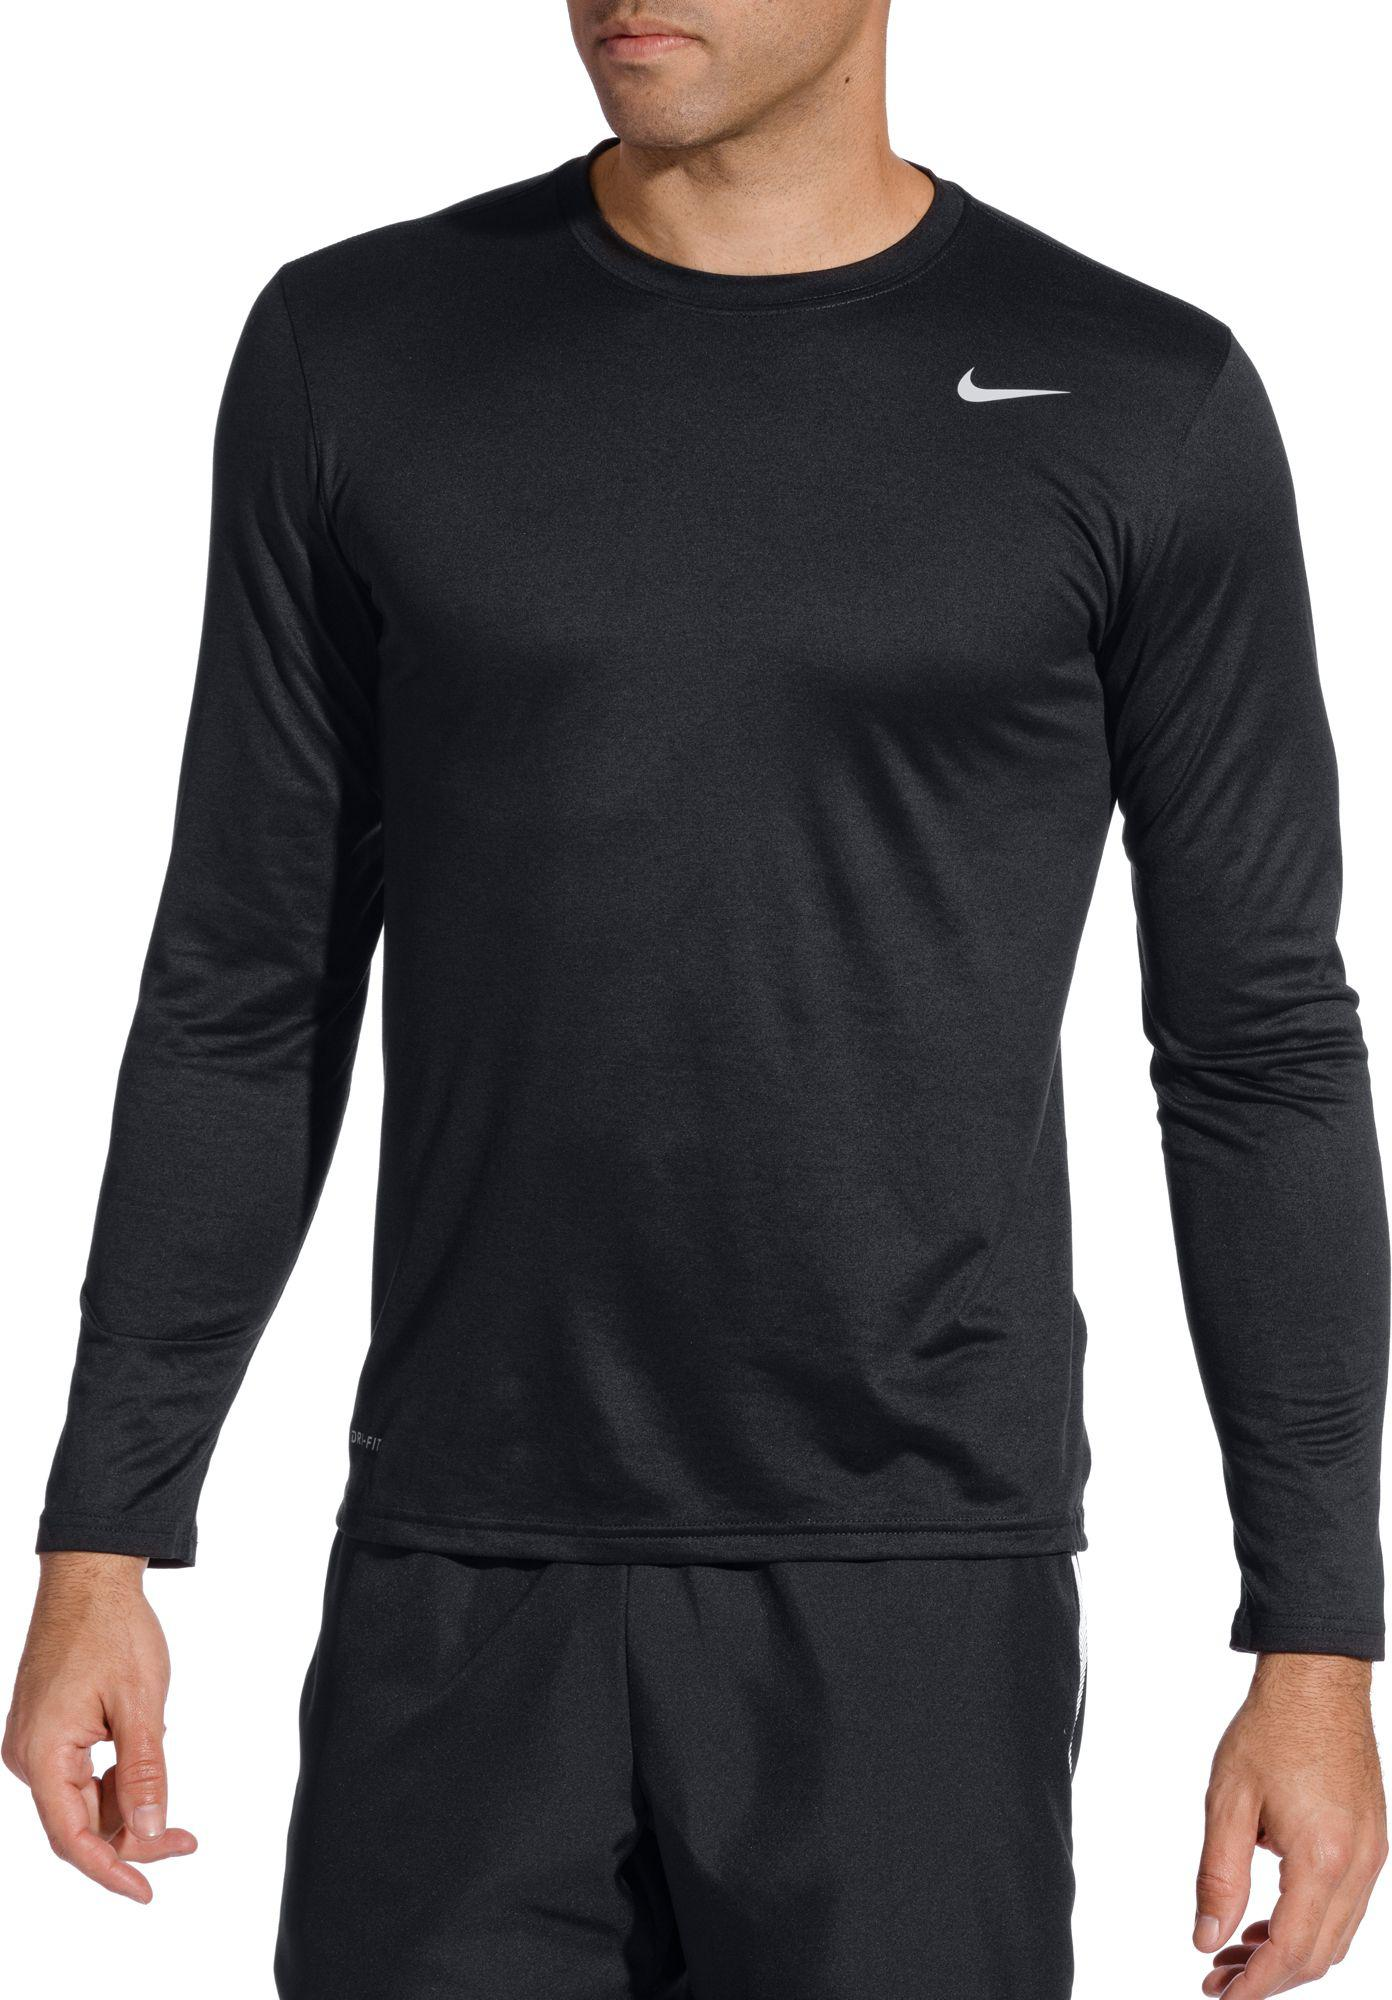 6f06fcee Lyst - Nike Legend Long Sleeve Shirt in Black for Men